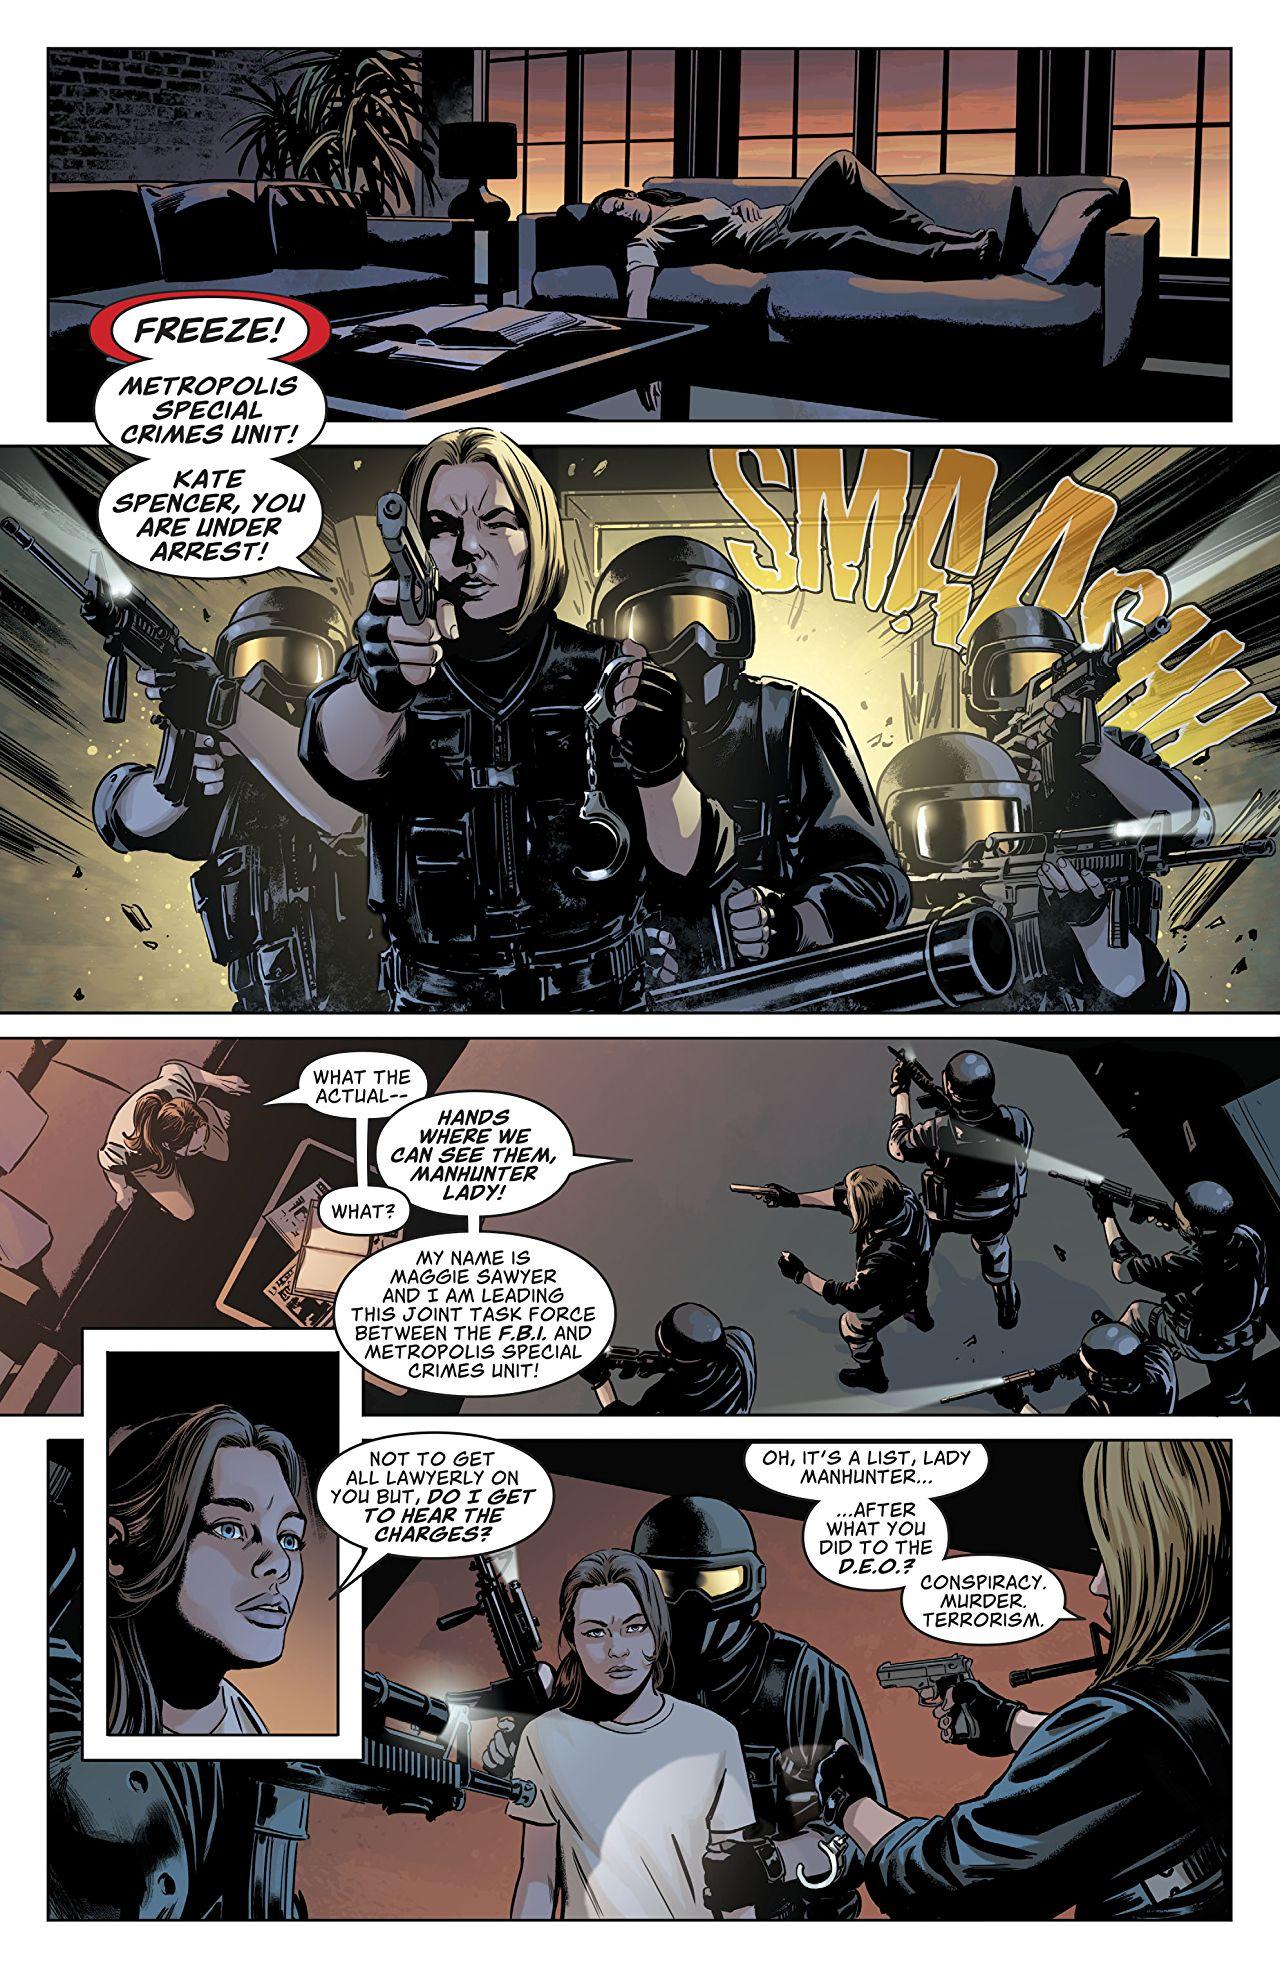 Action Comics 1011 2.jpg